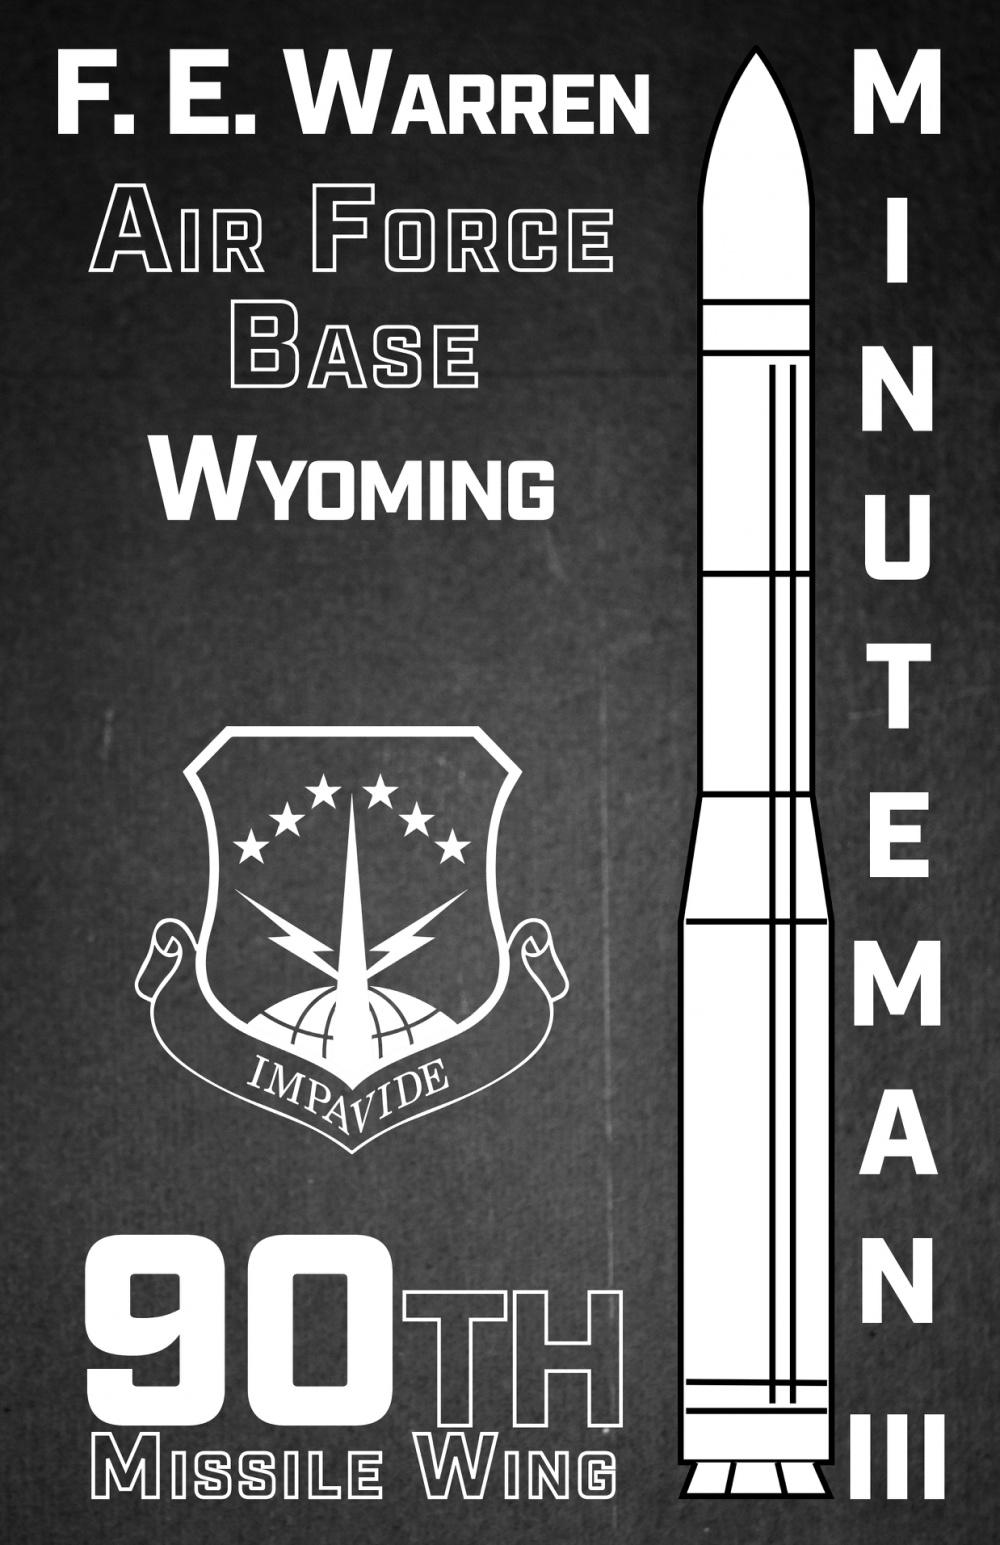 F. E. Warren and the Minuteman III